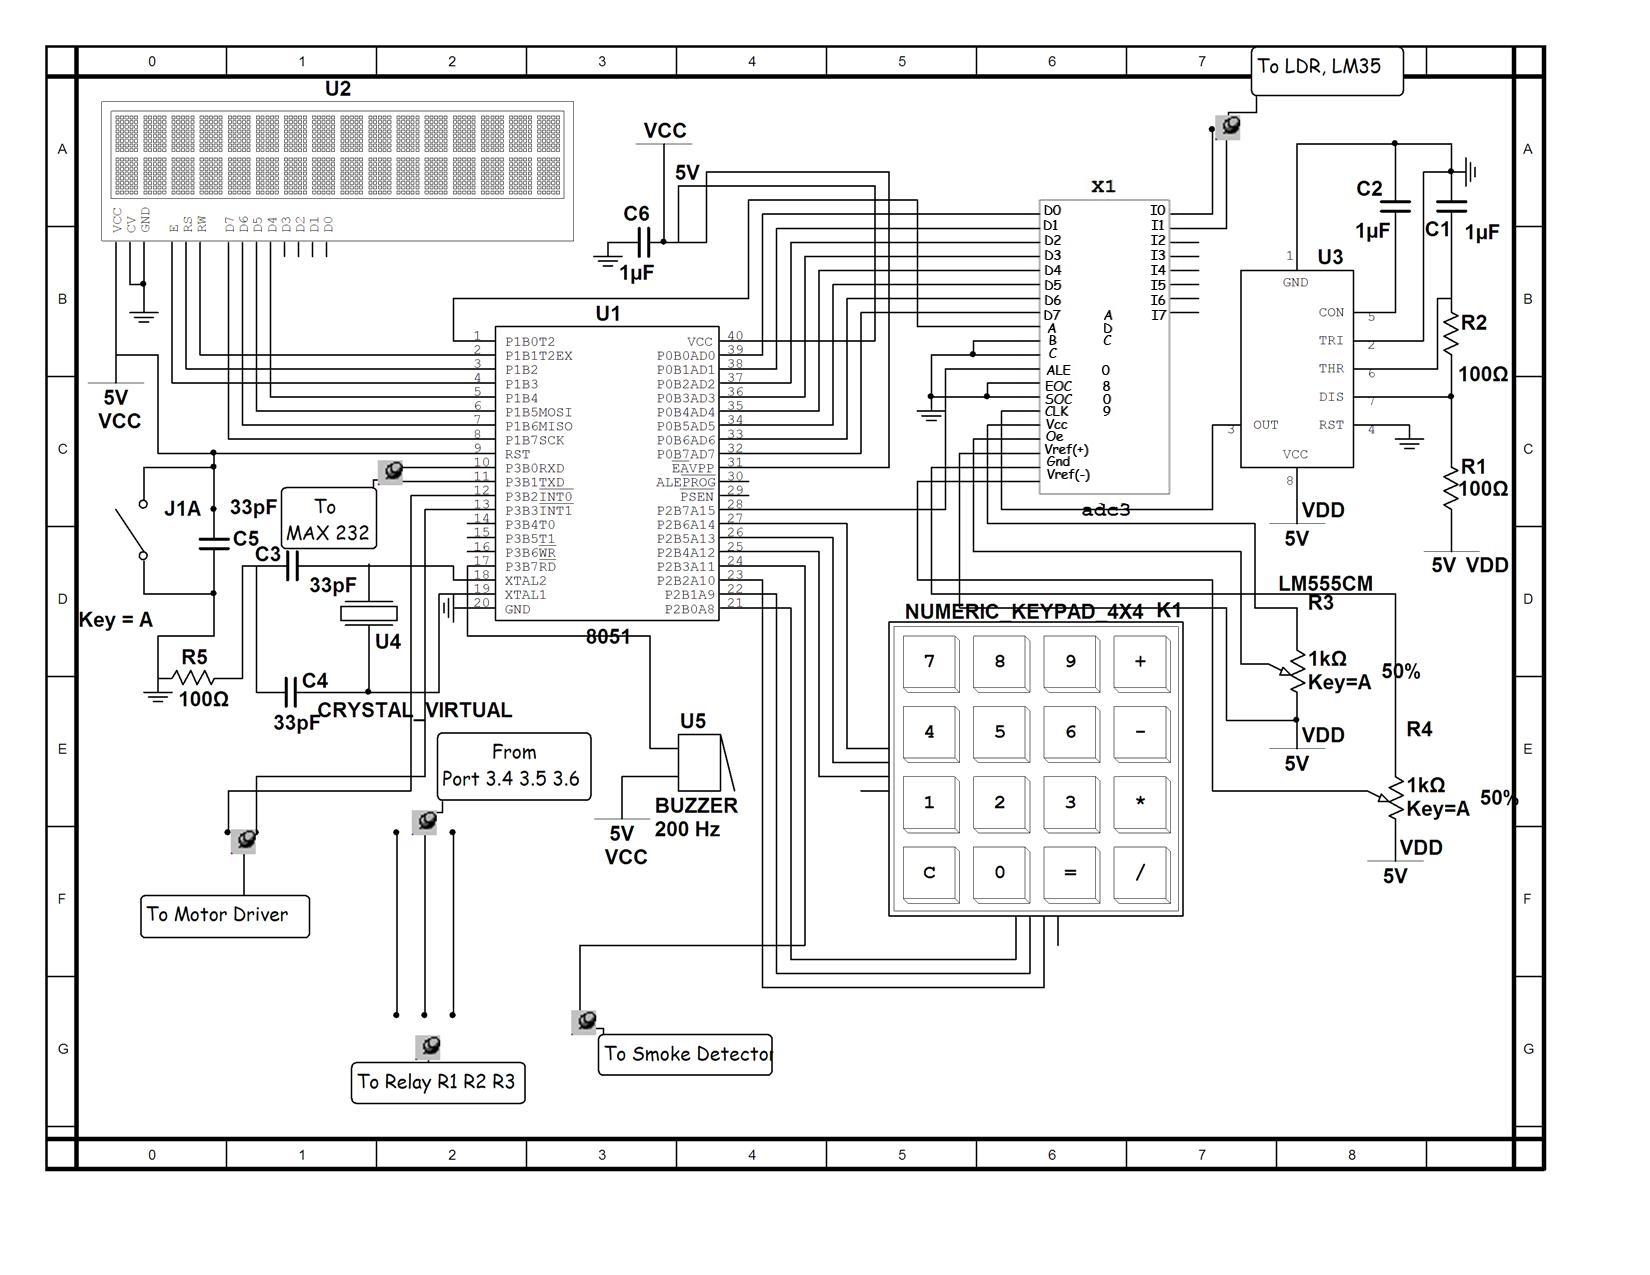 AT_4966] Hills Home Hub Wiring Diagram Download DiagramMill Ilari Benkeme Mohammedshrine Librar Wiring 101